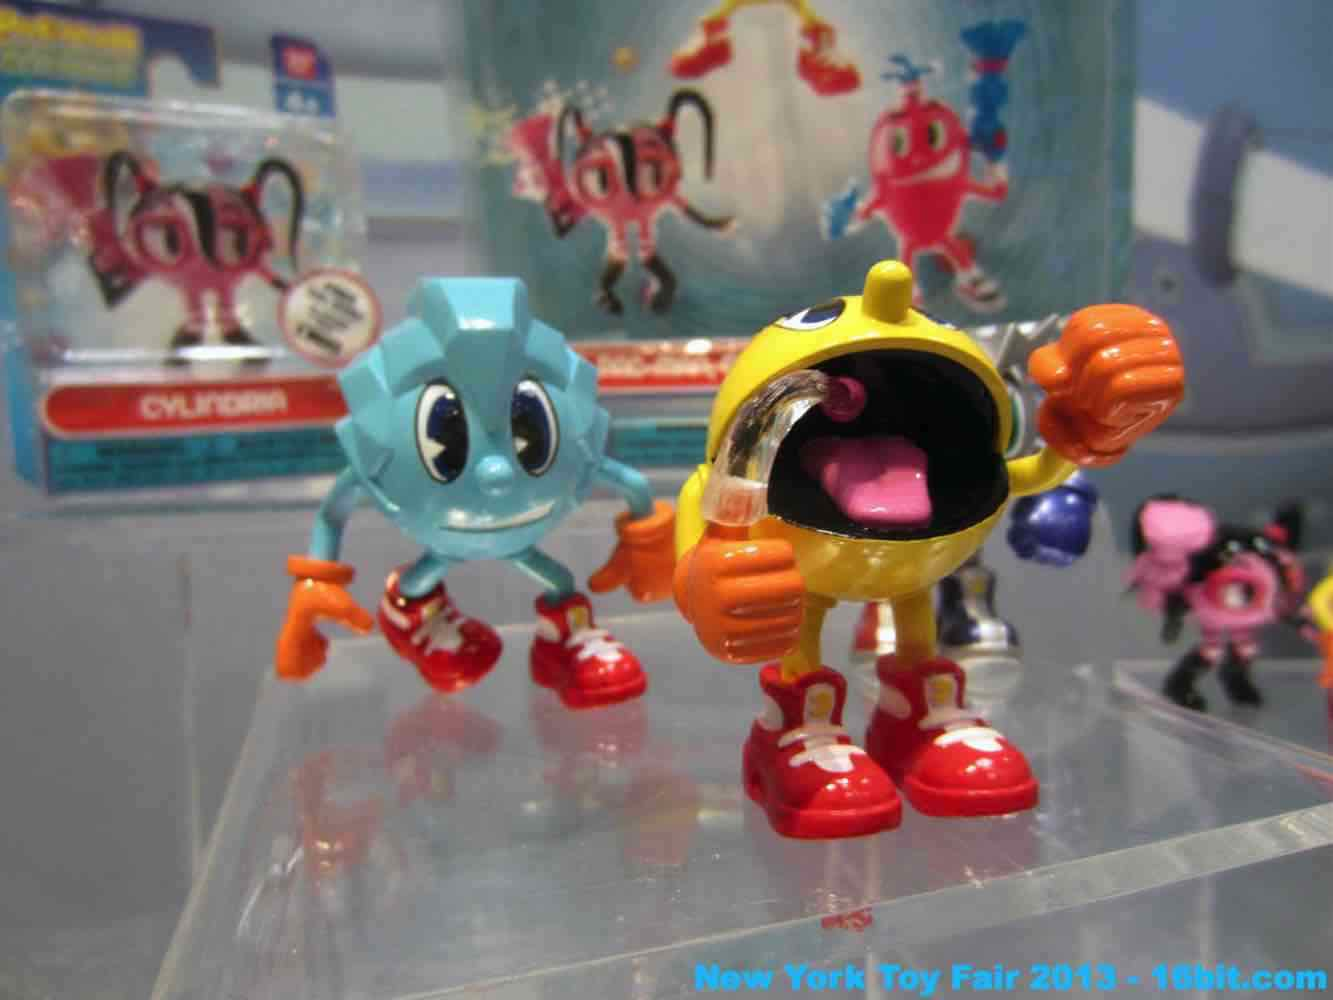 16bit Com Toy Fair Coverage Of Bandai Pac Man Action